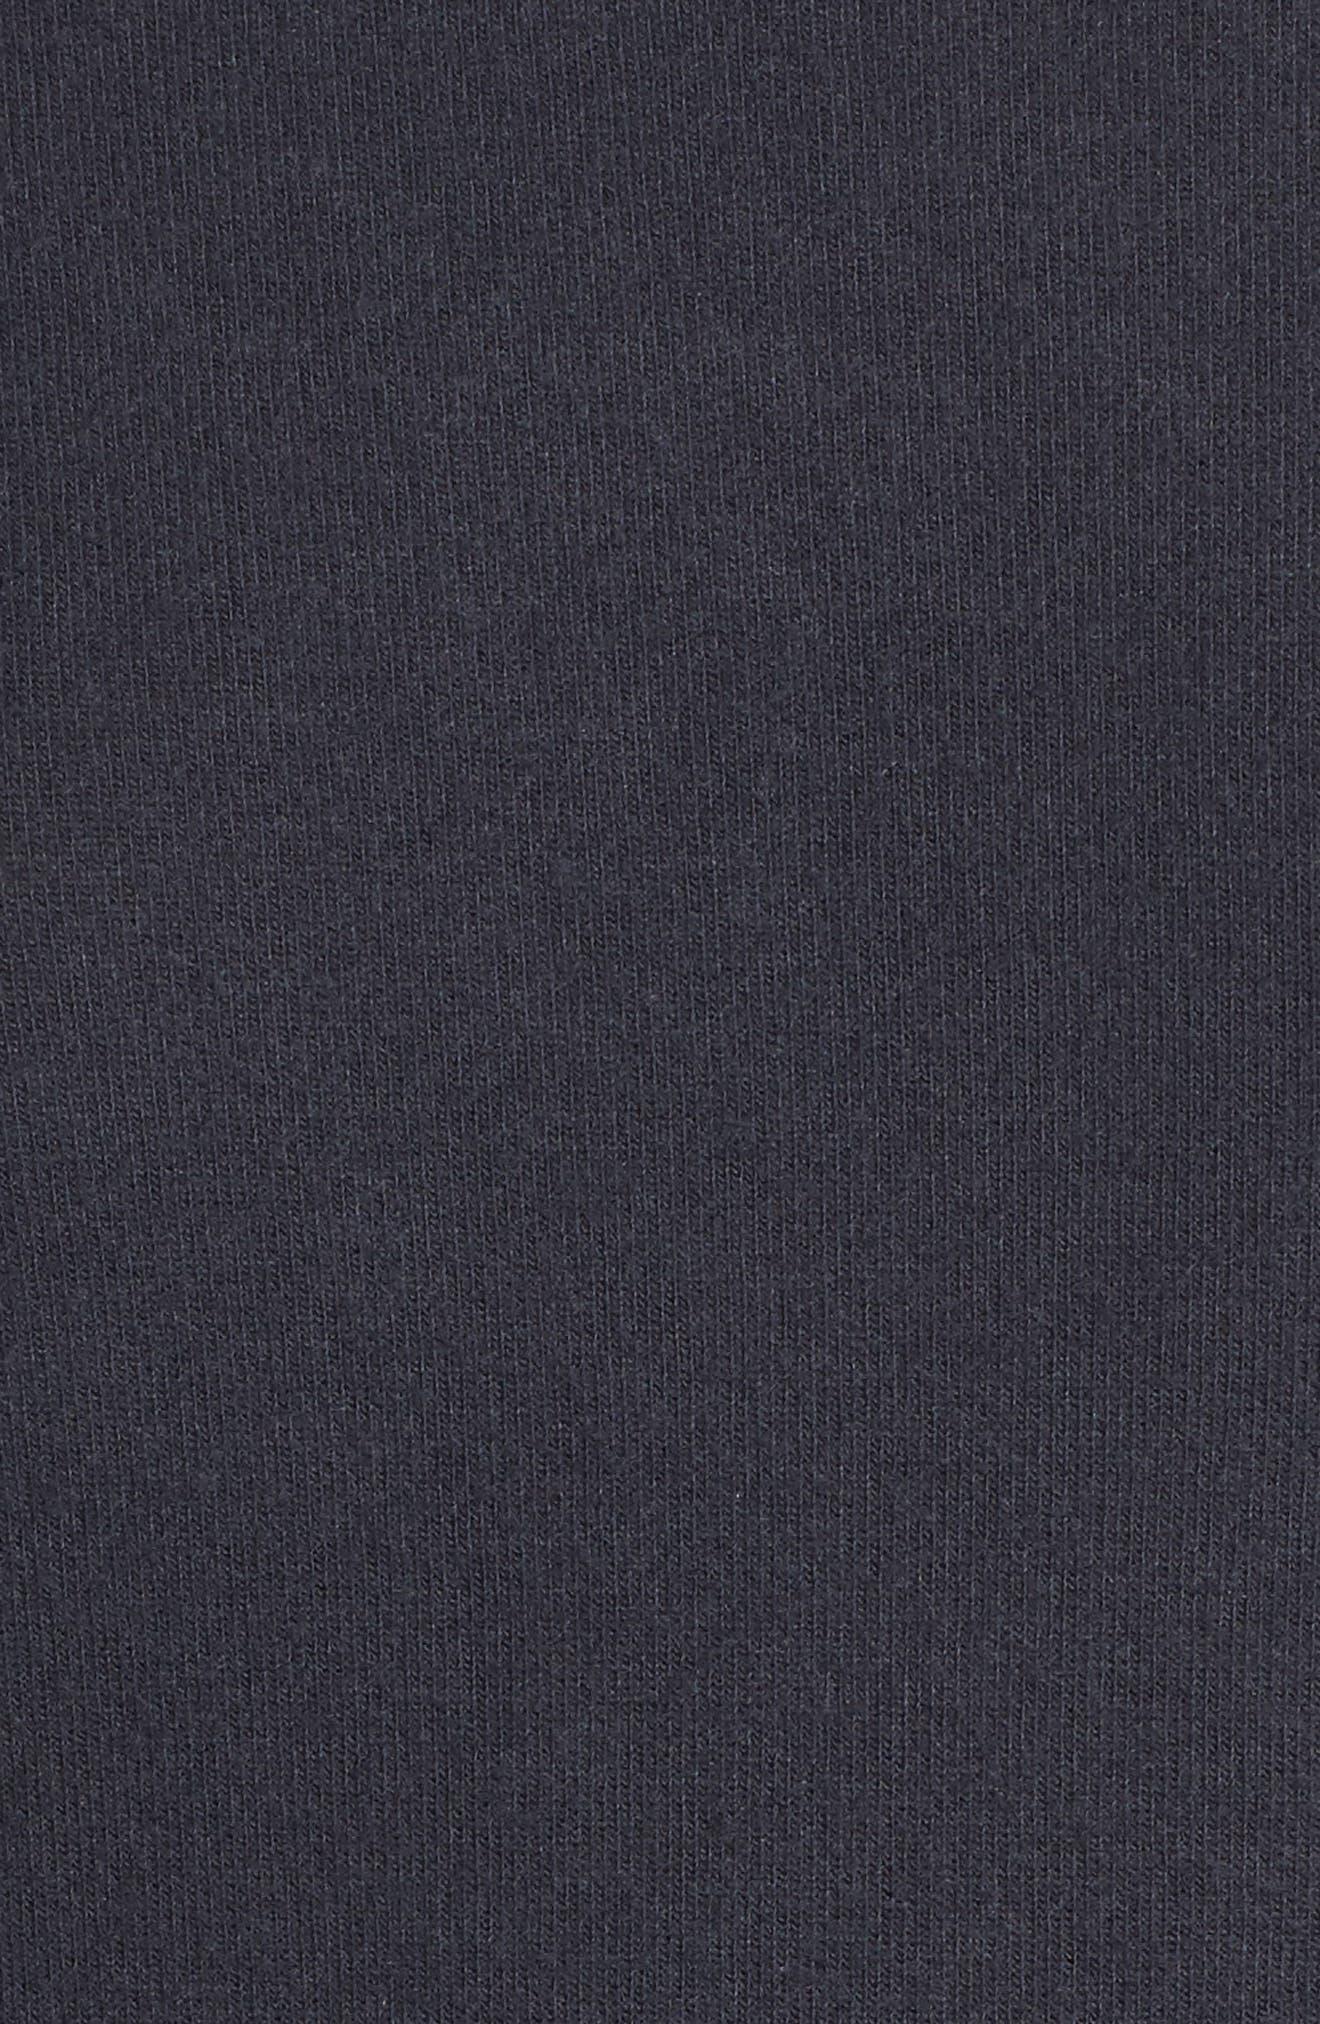 Peachy Jersey Ringer Top,                             Alternate thumbnail 5, color,                             030